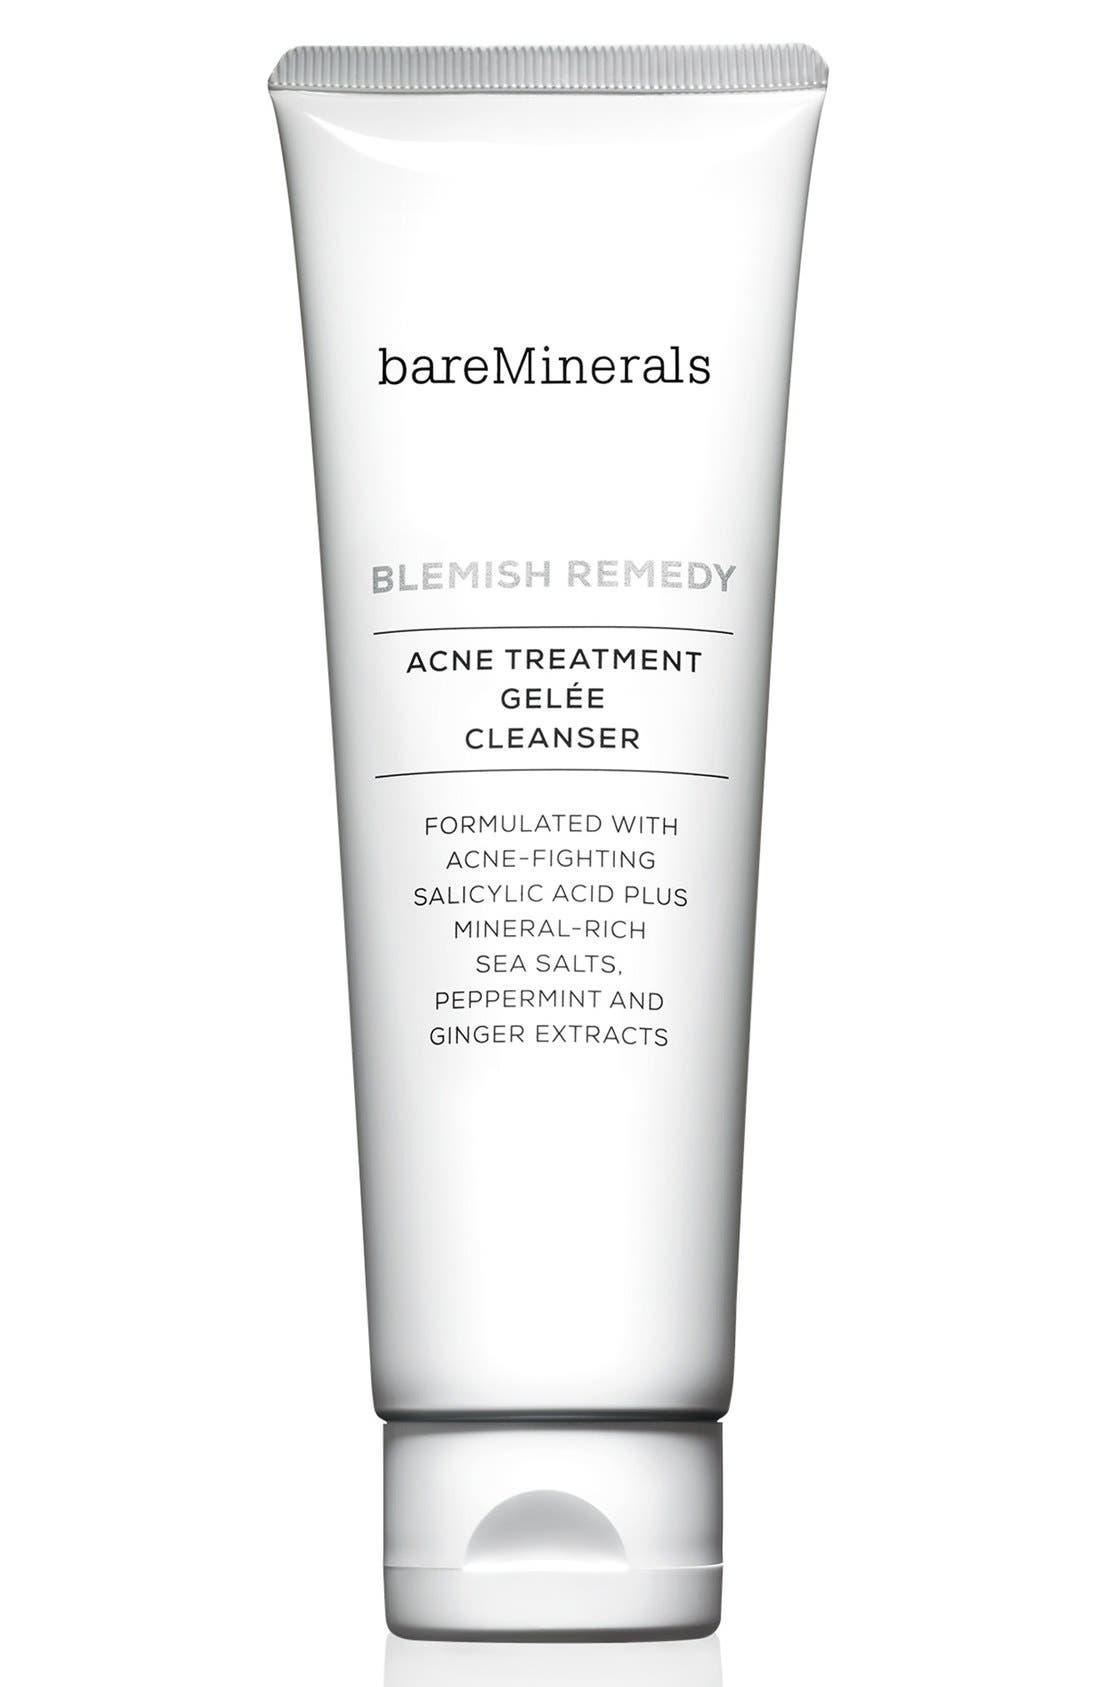 bareMinerals® Blemish Remedy Acne Treatment Gelée Cleanser